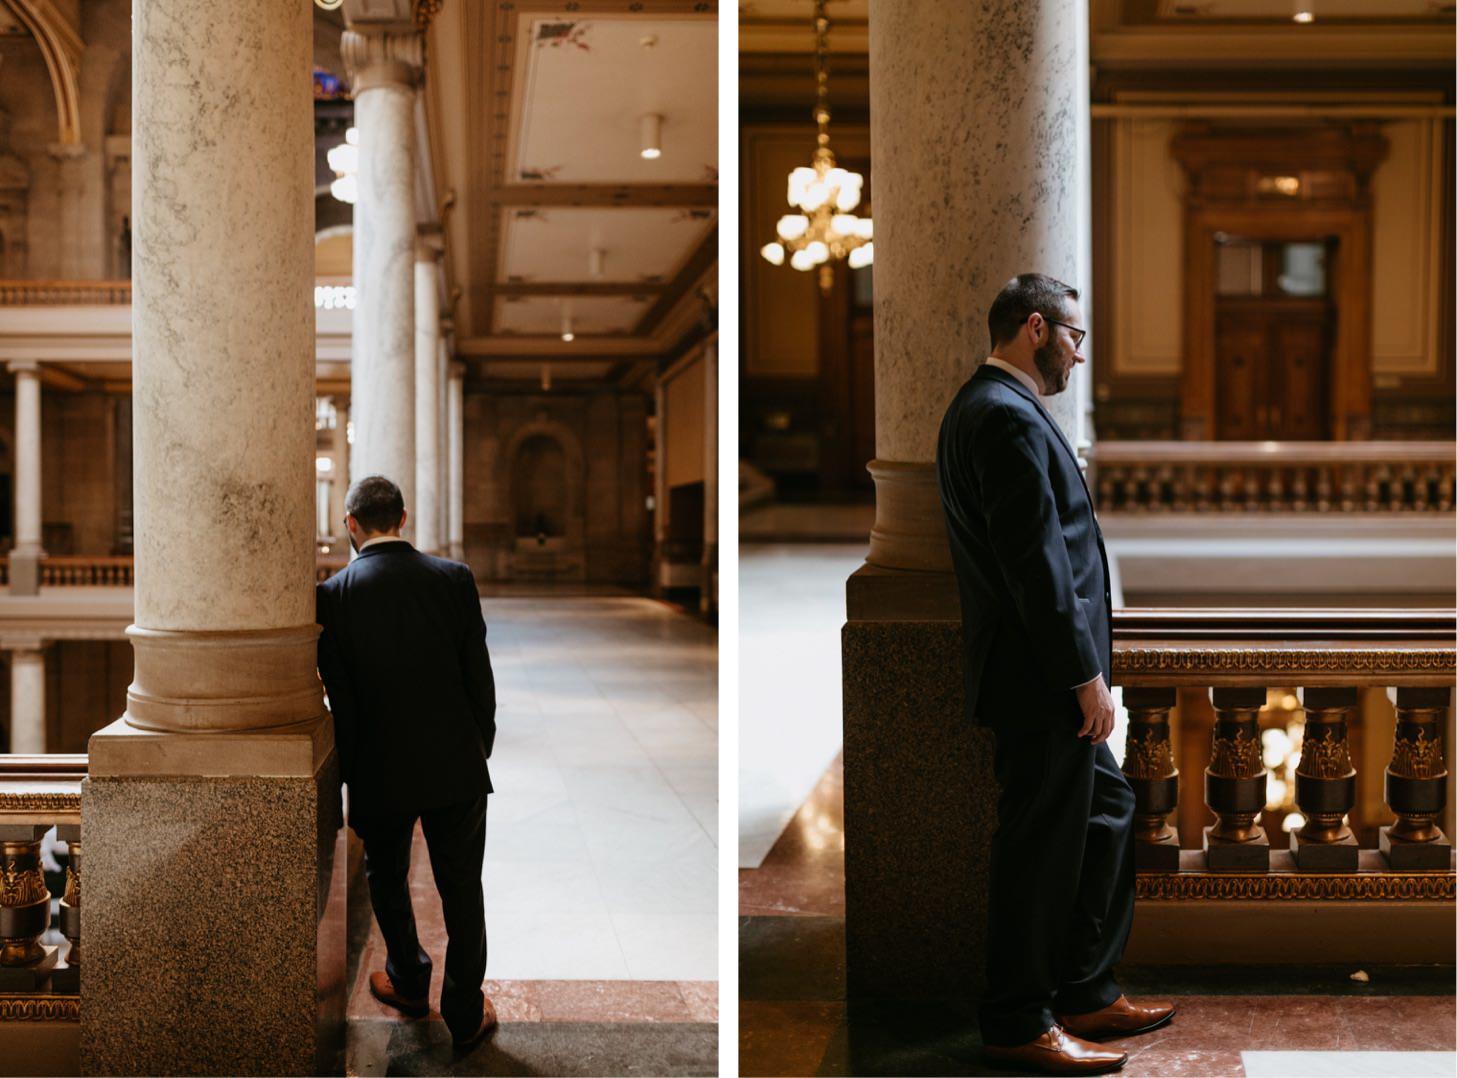 indiana-state-house-wedding-downtown-indianapolis-wedding-photographer011.JPG